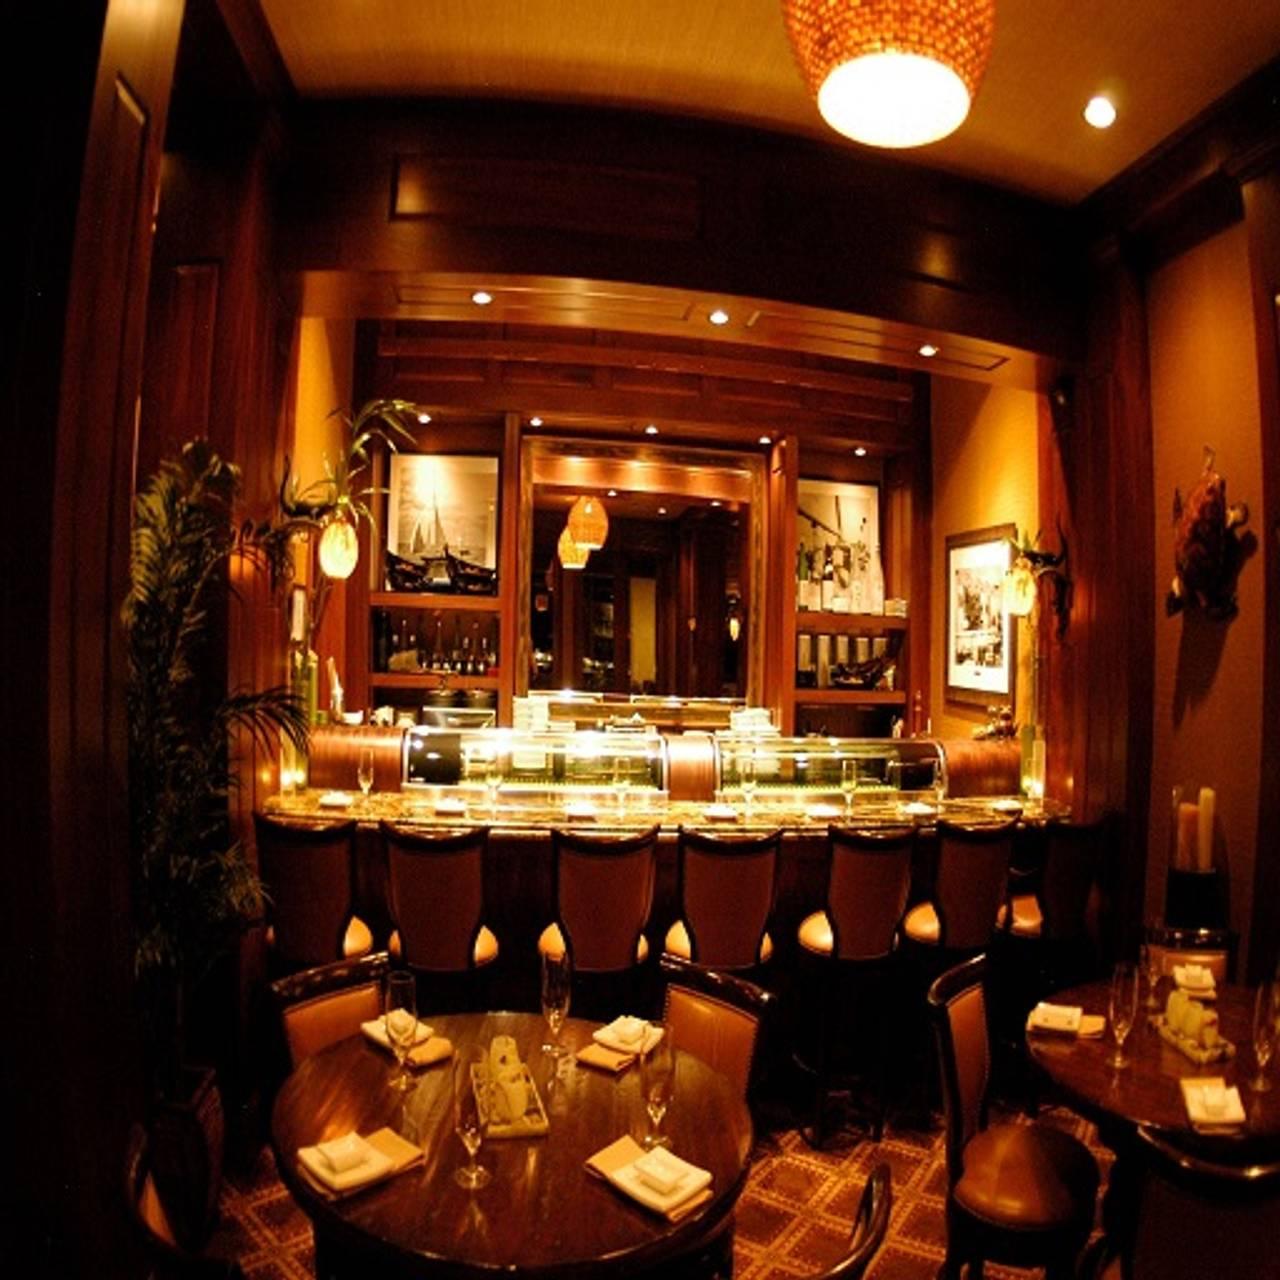 Nikai Sushi - Cheeca Lodge & Spa Restaurant - Islamorada, FL ... on hershey lodge map, kalaloch lodge map, snake river lodge map, el silencio lodge map, stein eriksen lodge map, cedar breaks lodge map, yosemite lodge map, stowe mountain lodge map,